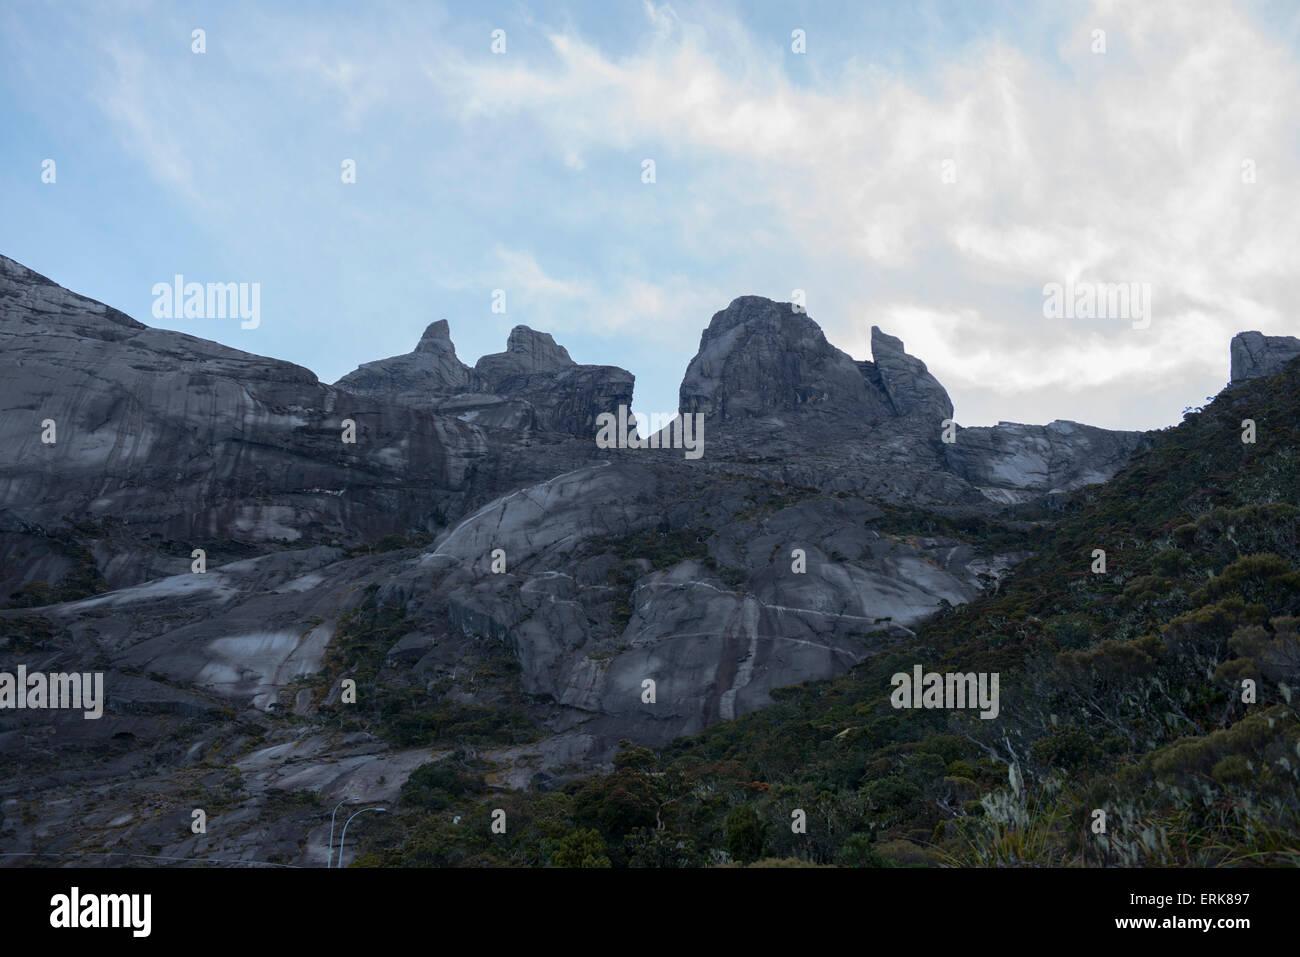 The peak, Mount Kinabalu, Sabah, Borneo, Malaysia - Stock Image